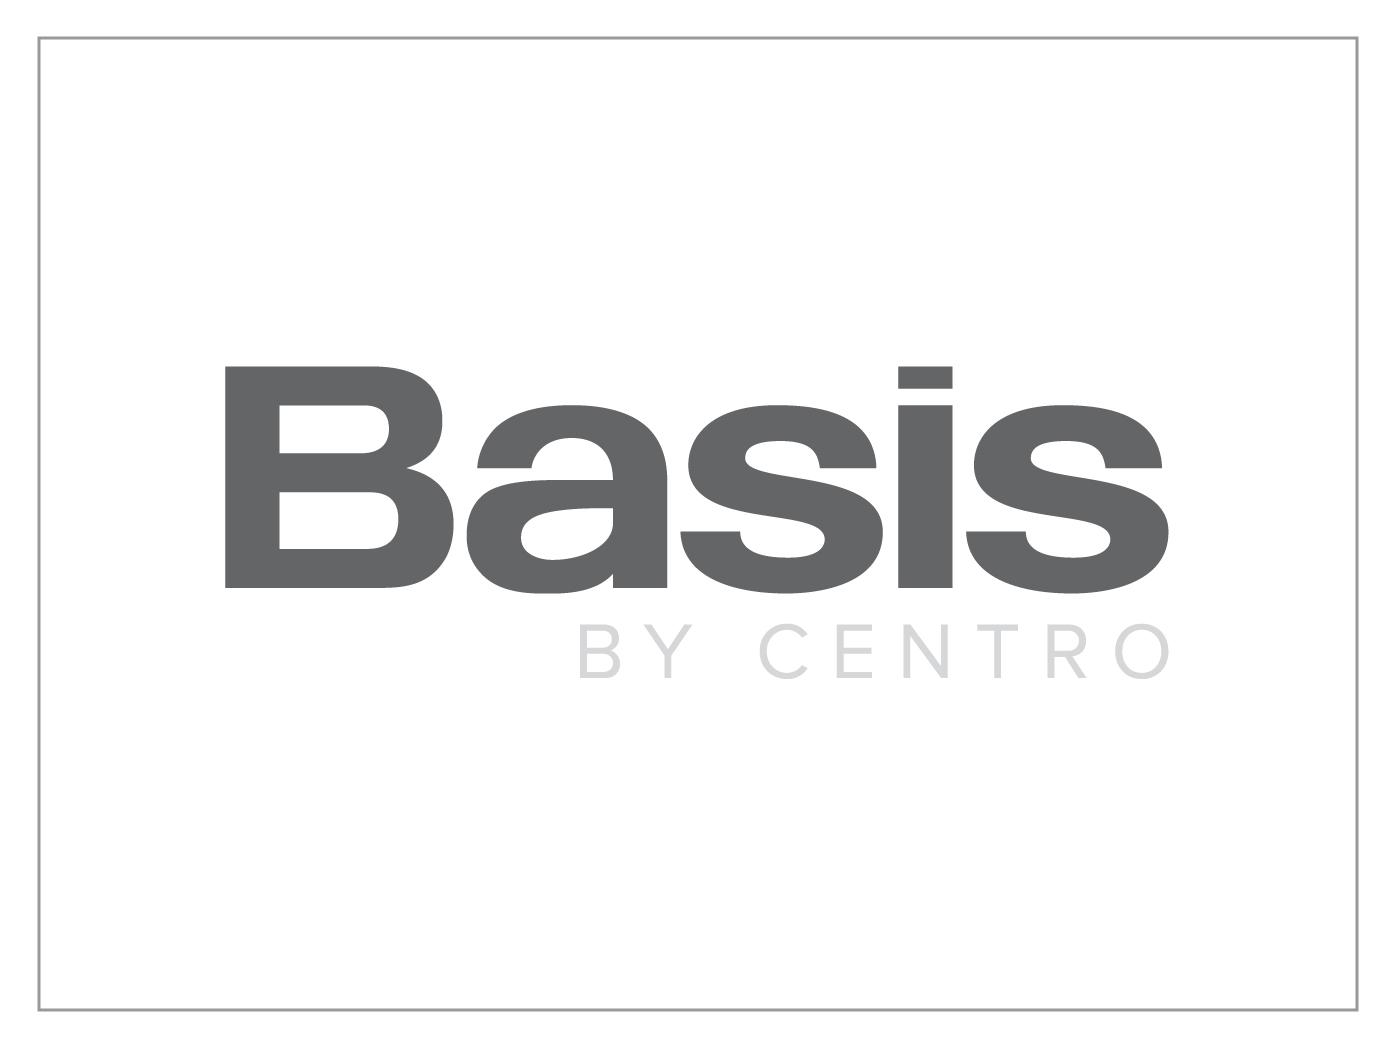 Basis-Centro-logo.jpg